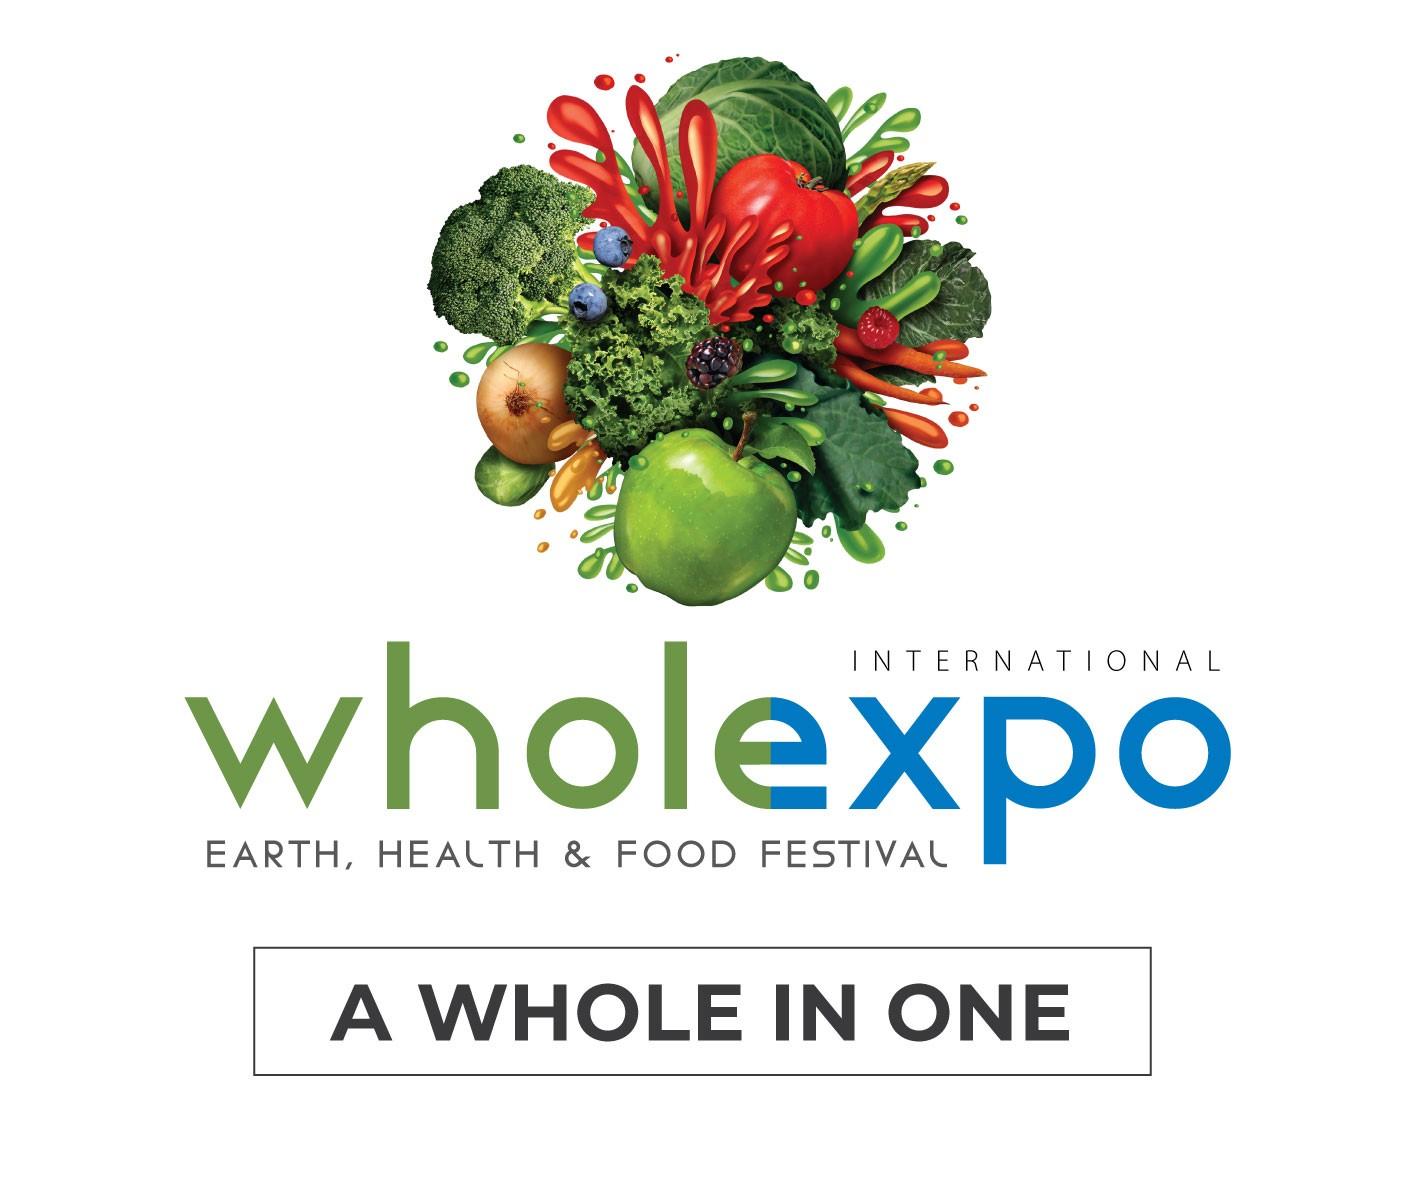 Wholexpo | WFPB.ORG